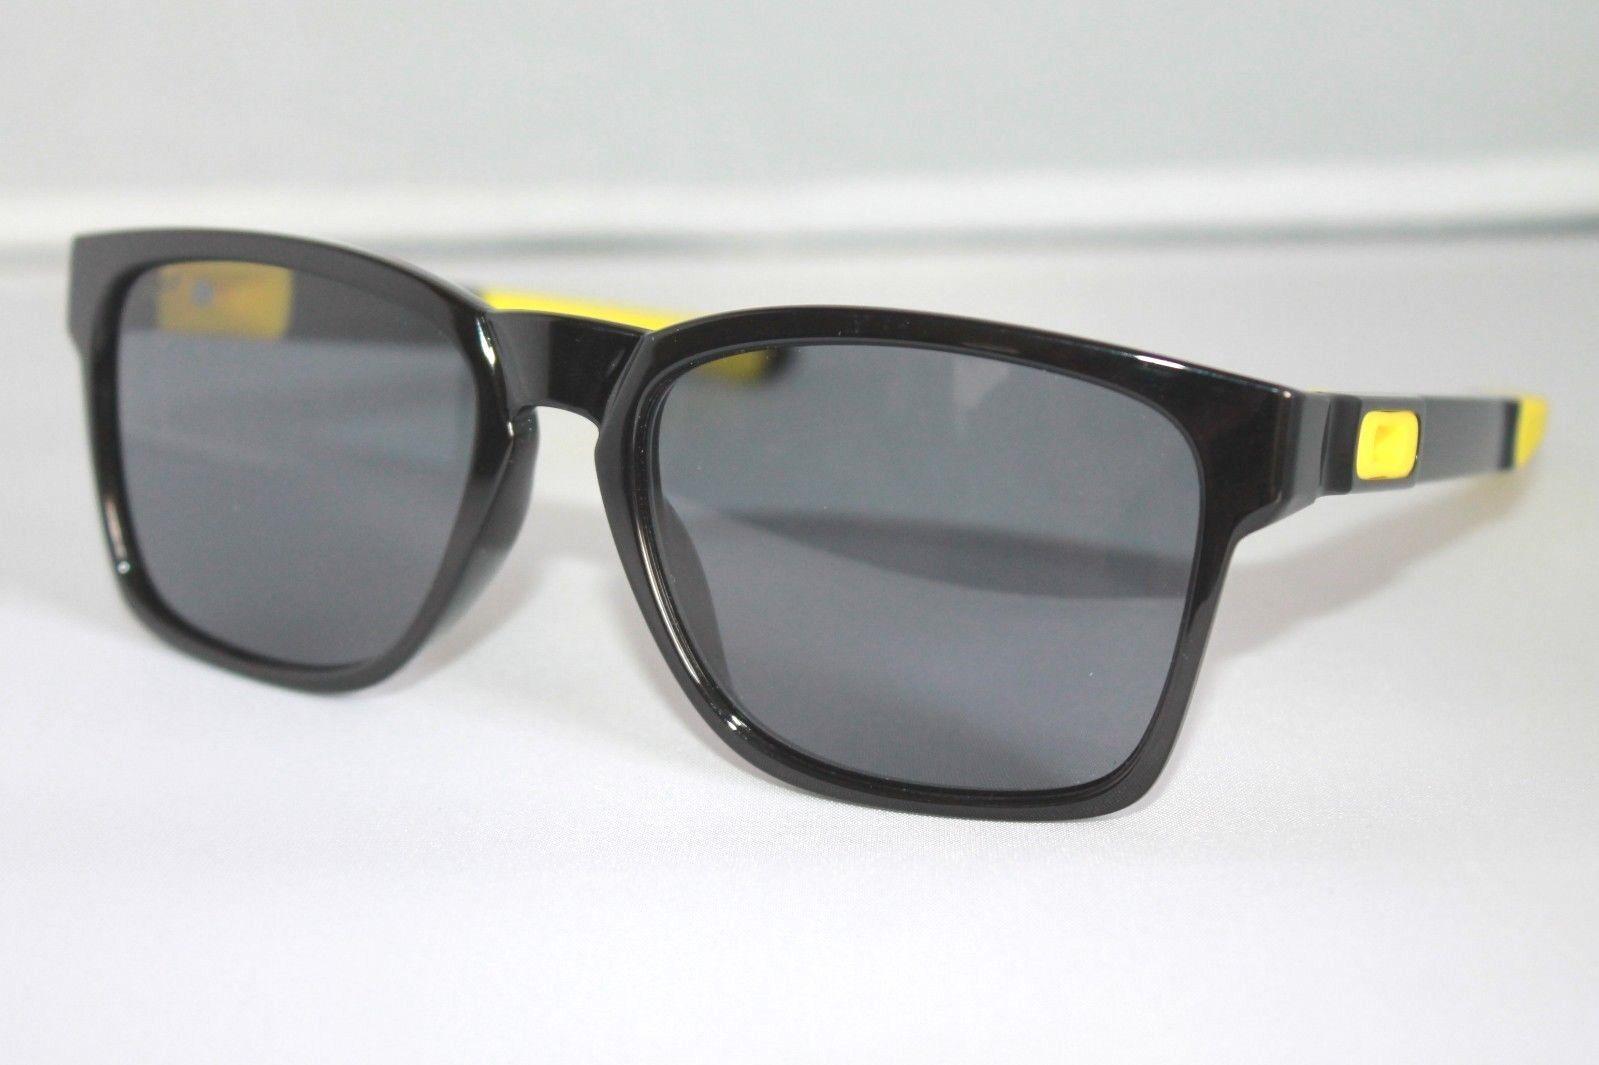 06abe014f4 Oakley Sunglasses Catalyst Valentino Rossi Vr46 Polished Black ...